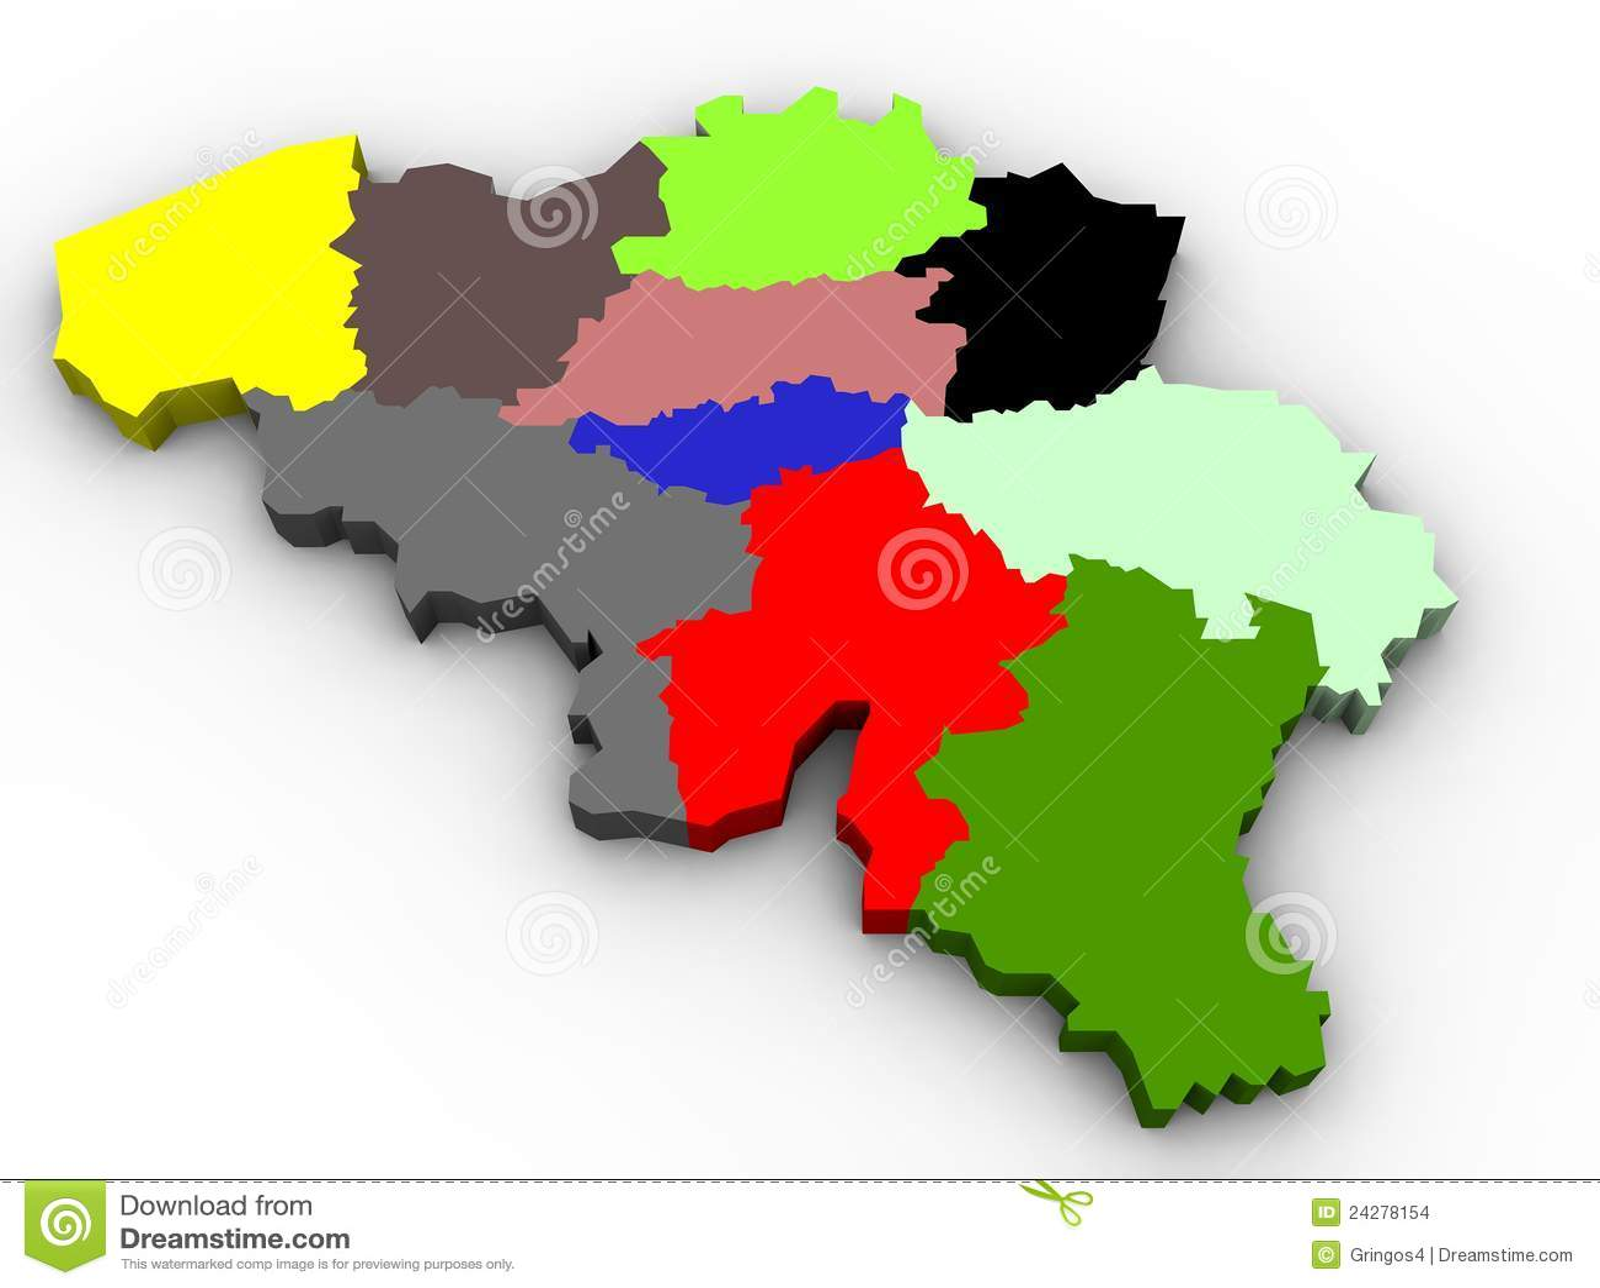 Illustration Of The Belgium Provinces Map Images Image – Belgium Provinces Map